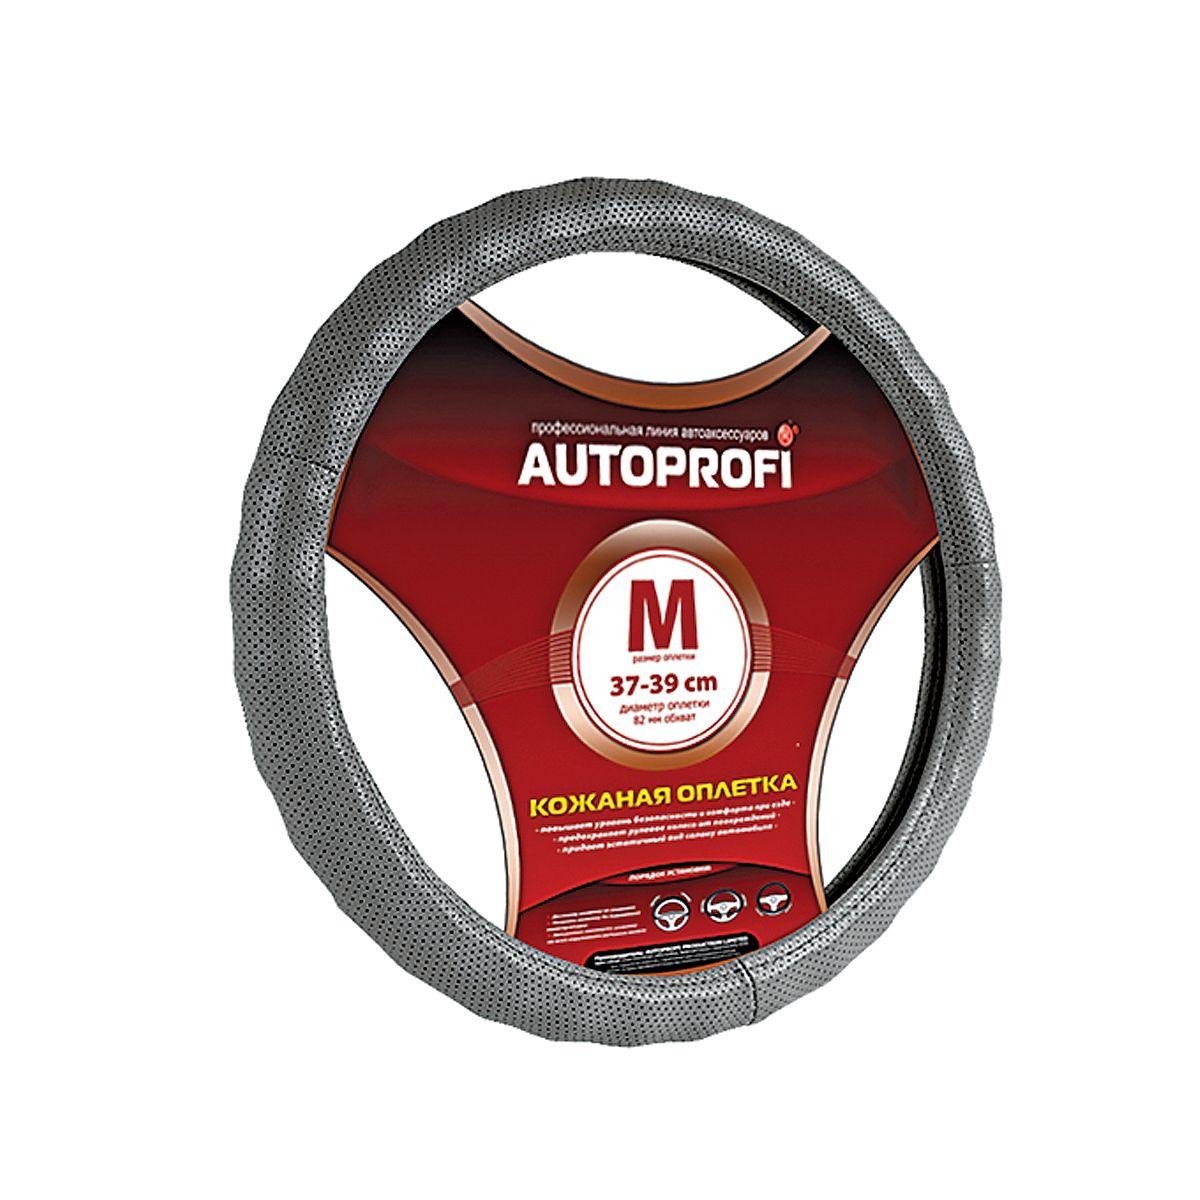 Оплетка Autoprofi Ap-396 d.gy (m)